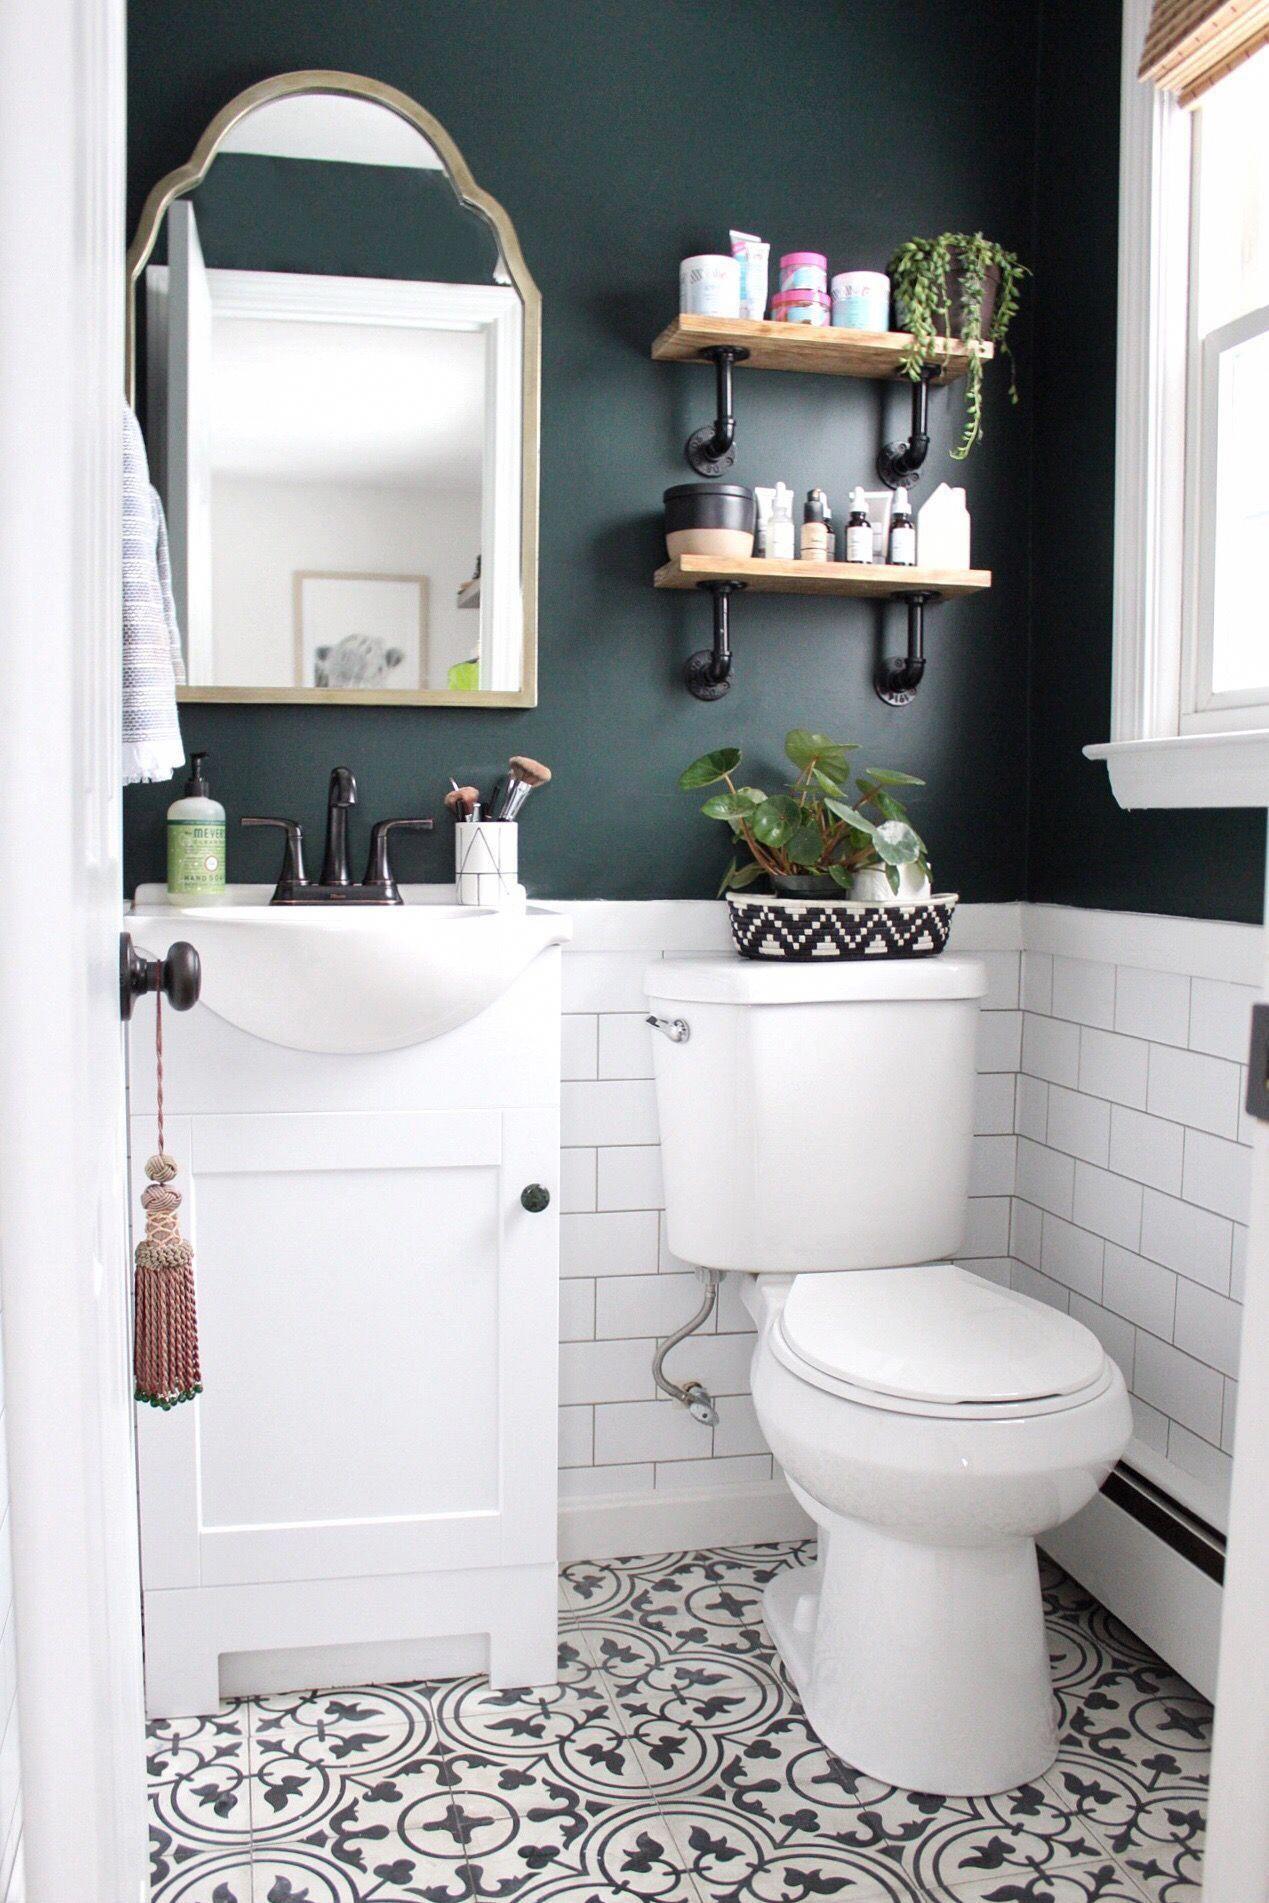 Green Bathroom Tile Bathroom Design Small Small Bathroom Bathroom Interior Design Green bathroom decorating ideas